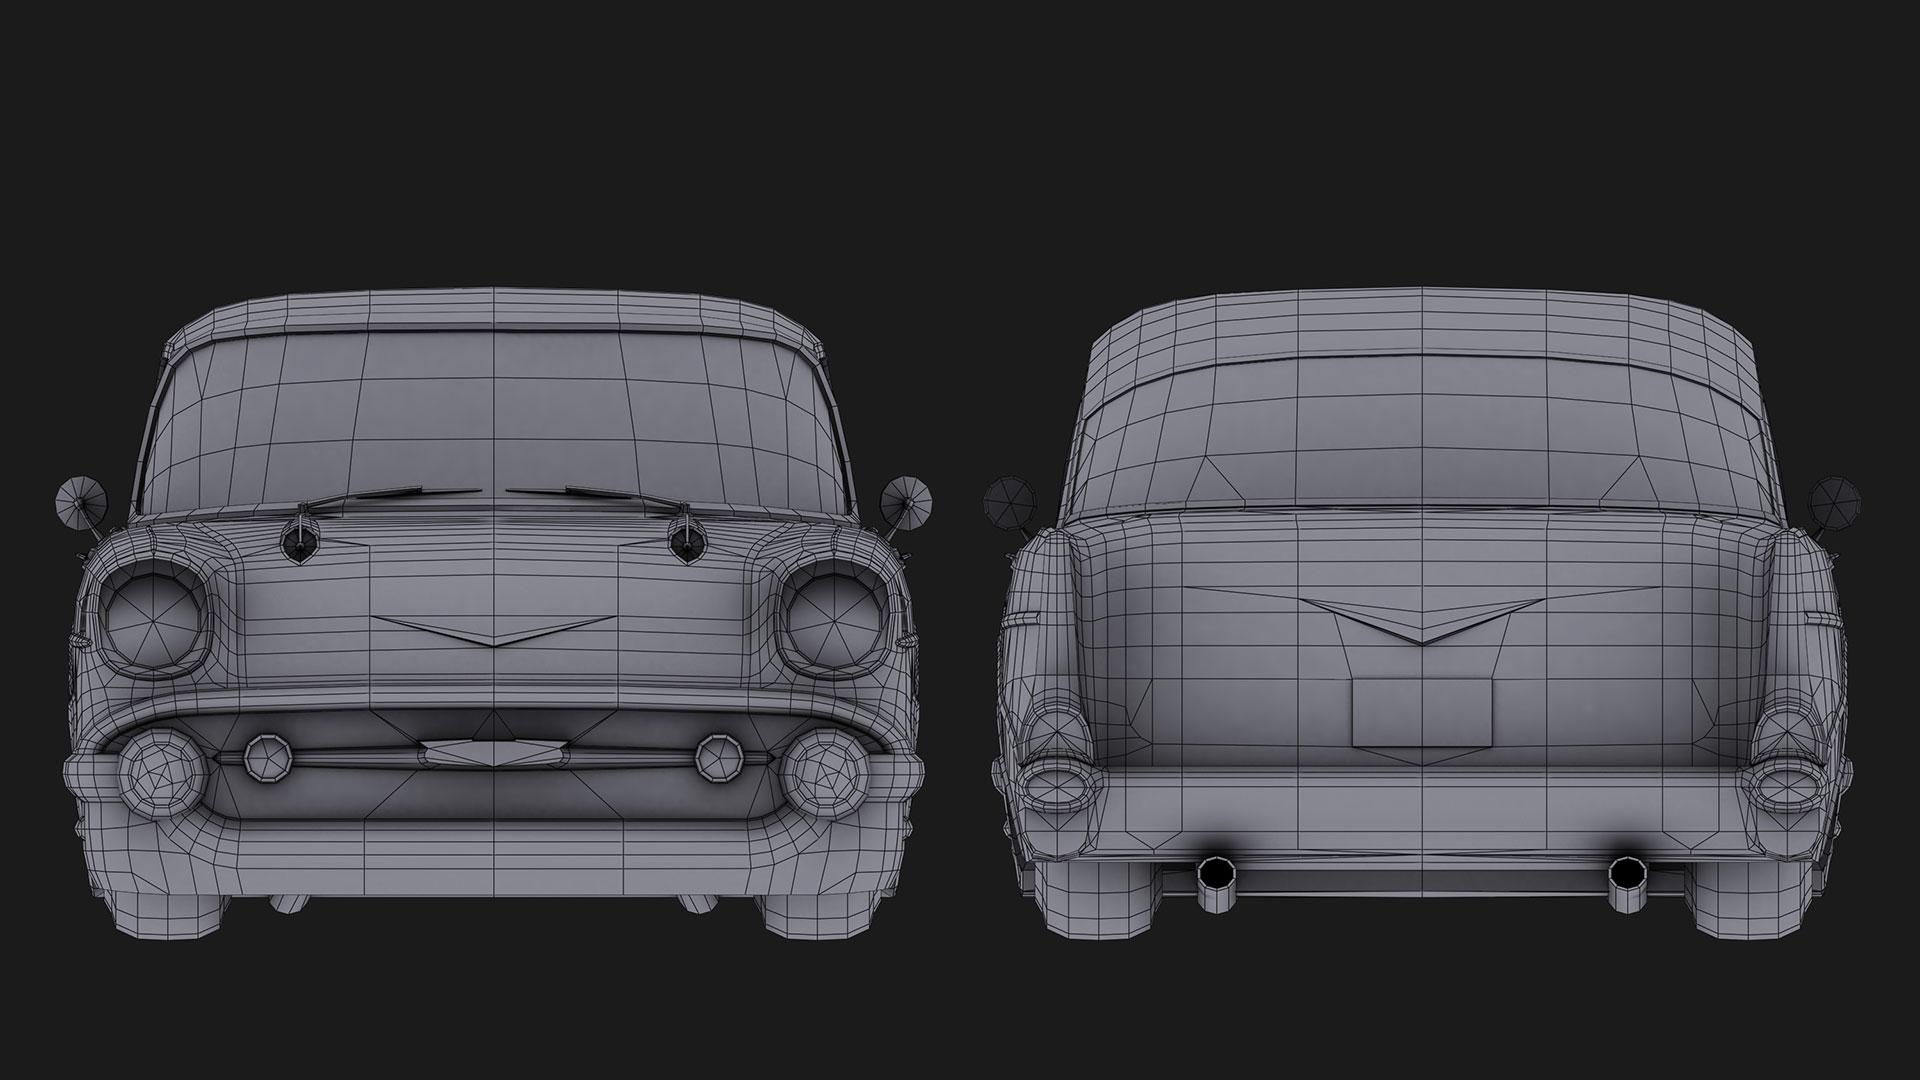 Chevrolet_Bel_Air_1957_Back&Front_wireframe